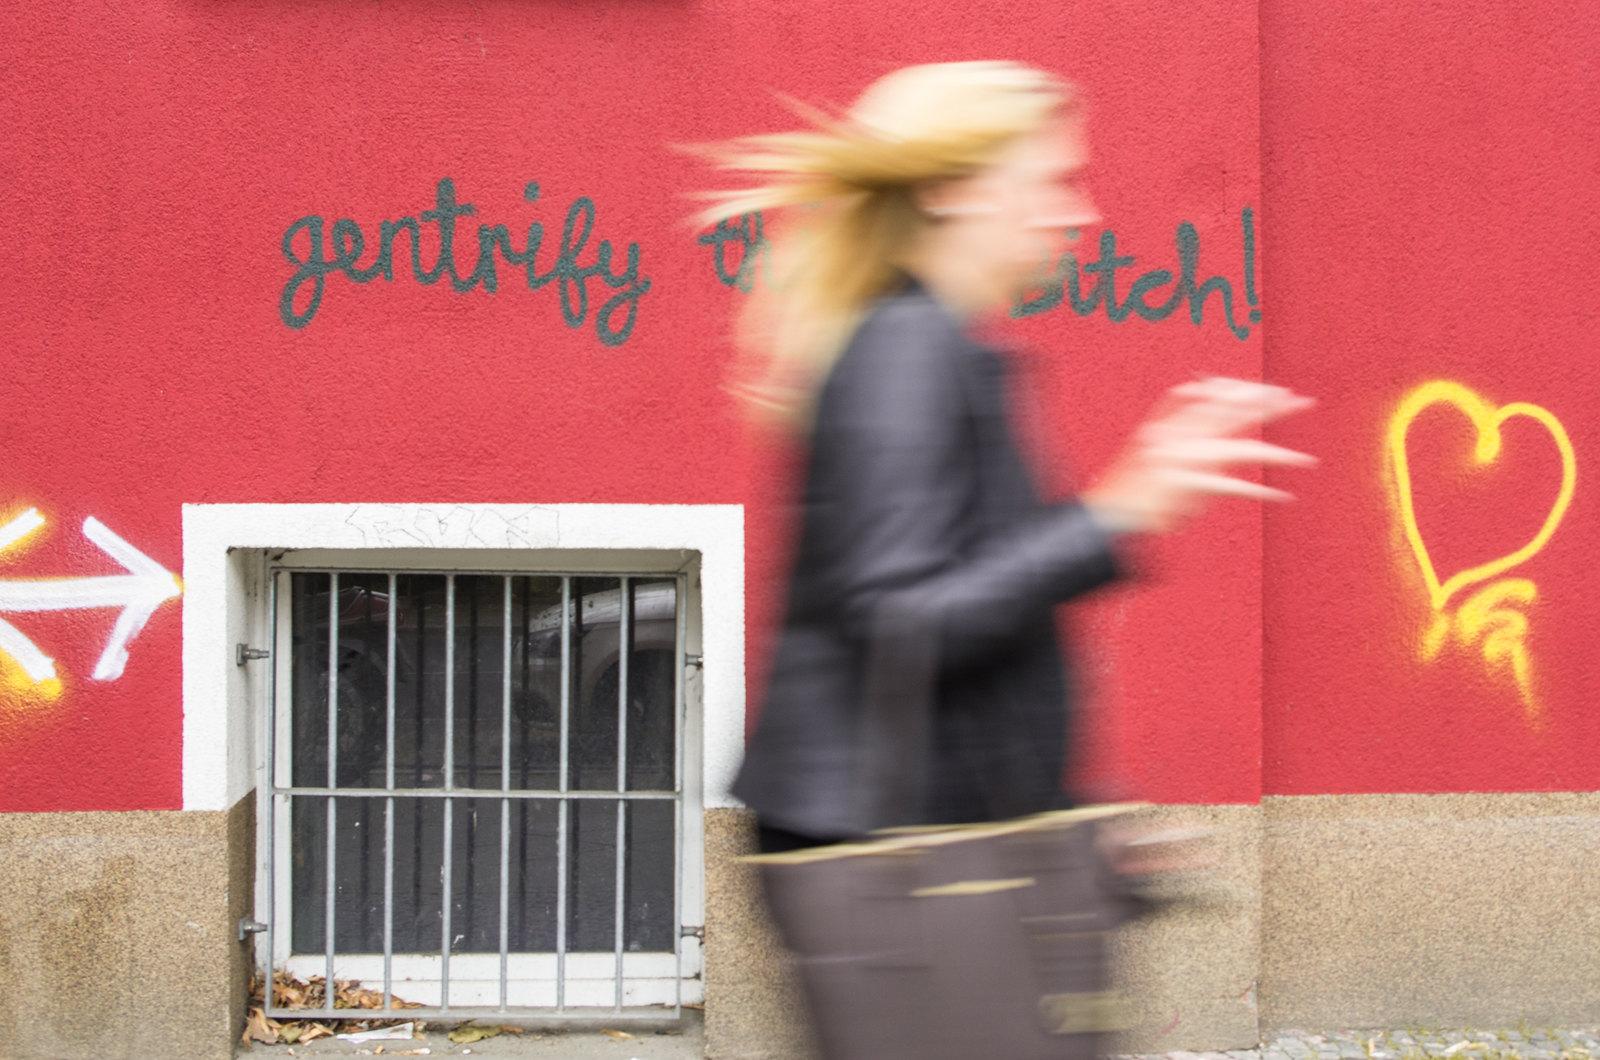 Berlin pauvre et sexy ? - Gentrify this, bitch !